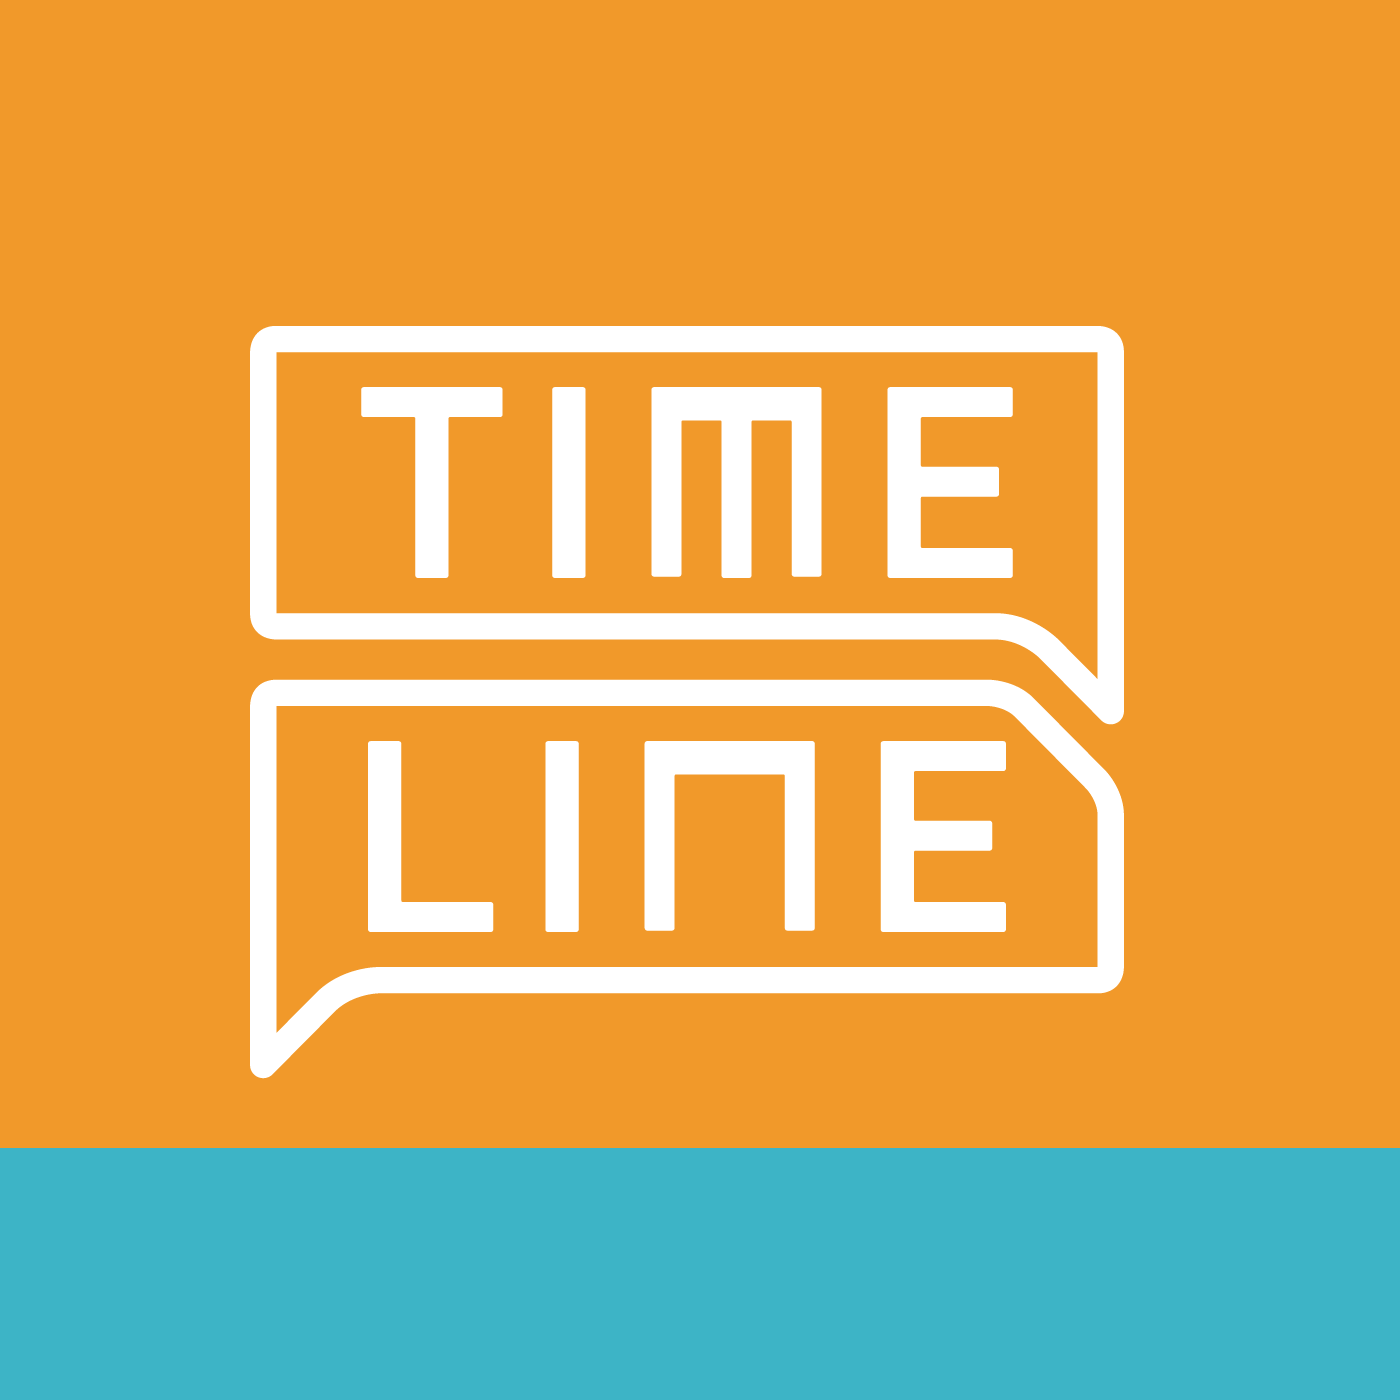 Timeline Gaúcha 18/01/2018